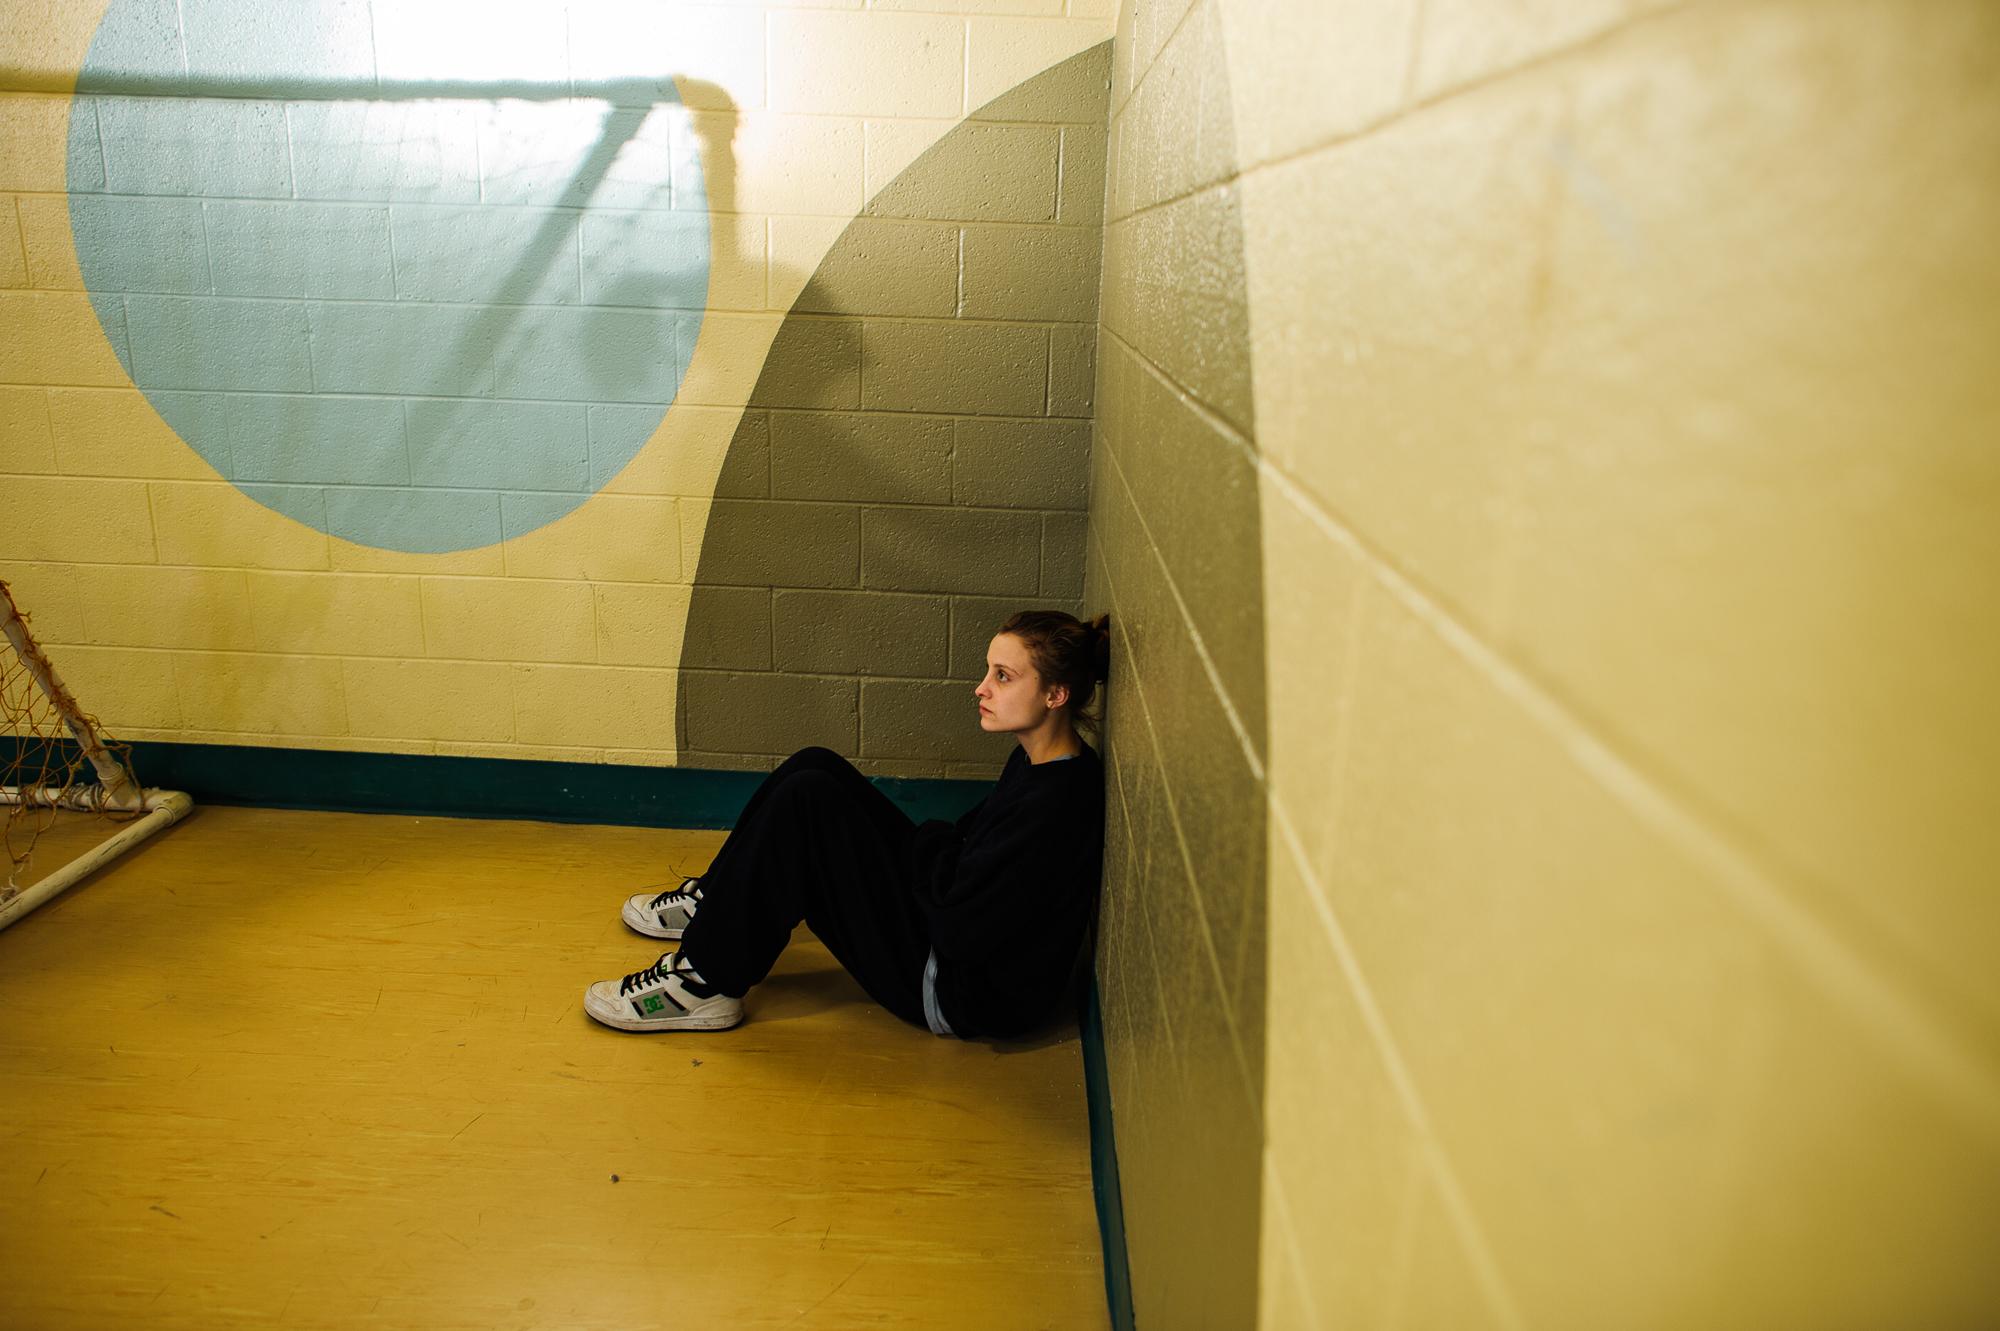 Alysia, age 16, sits inside the gym, as other girls play handball and basketball.